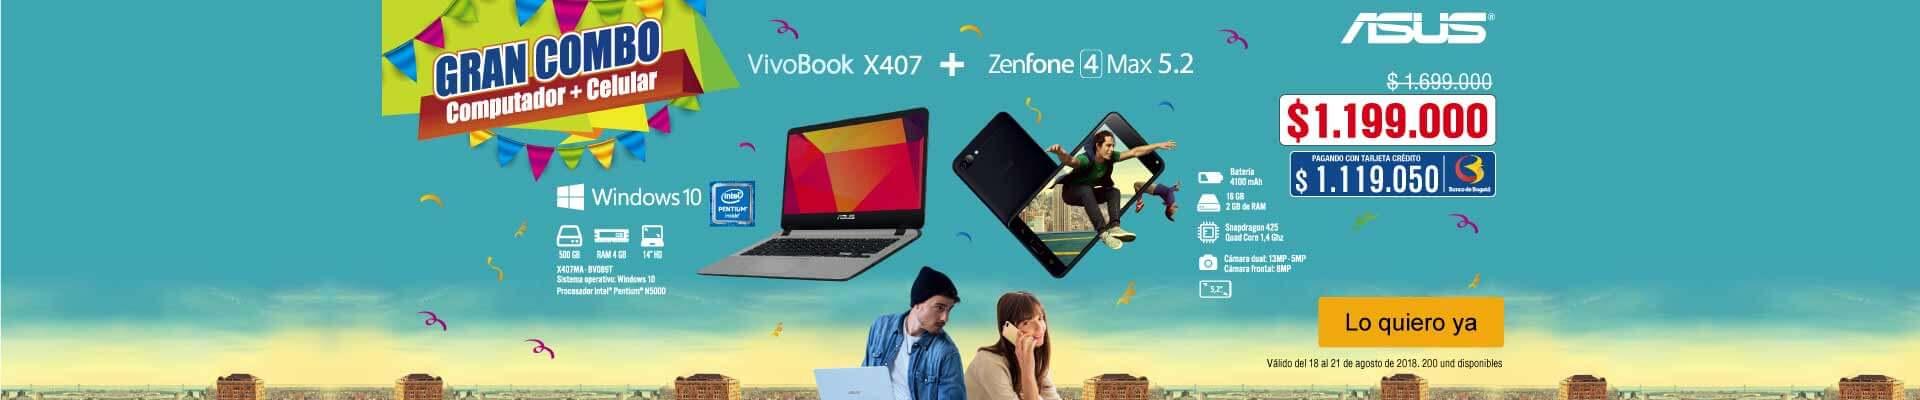 AK-PPAL-2-computadores y tablets-PP---Asus-Combo Asus portátil + celular-Ago18